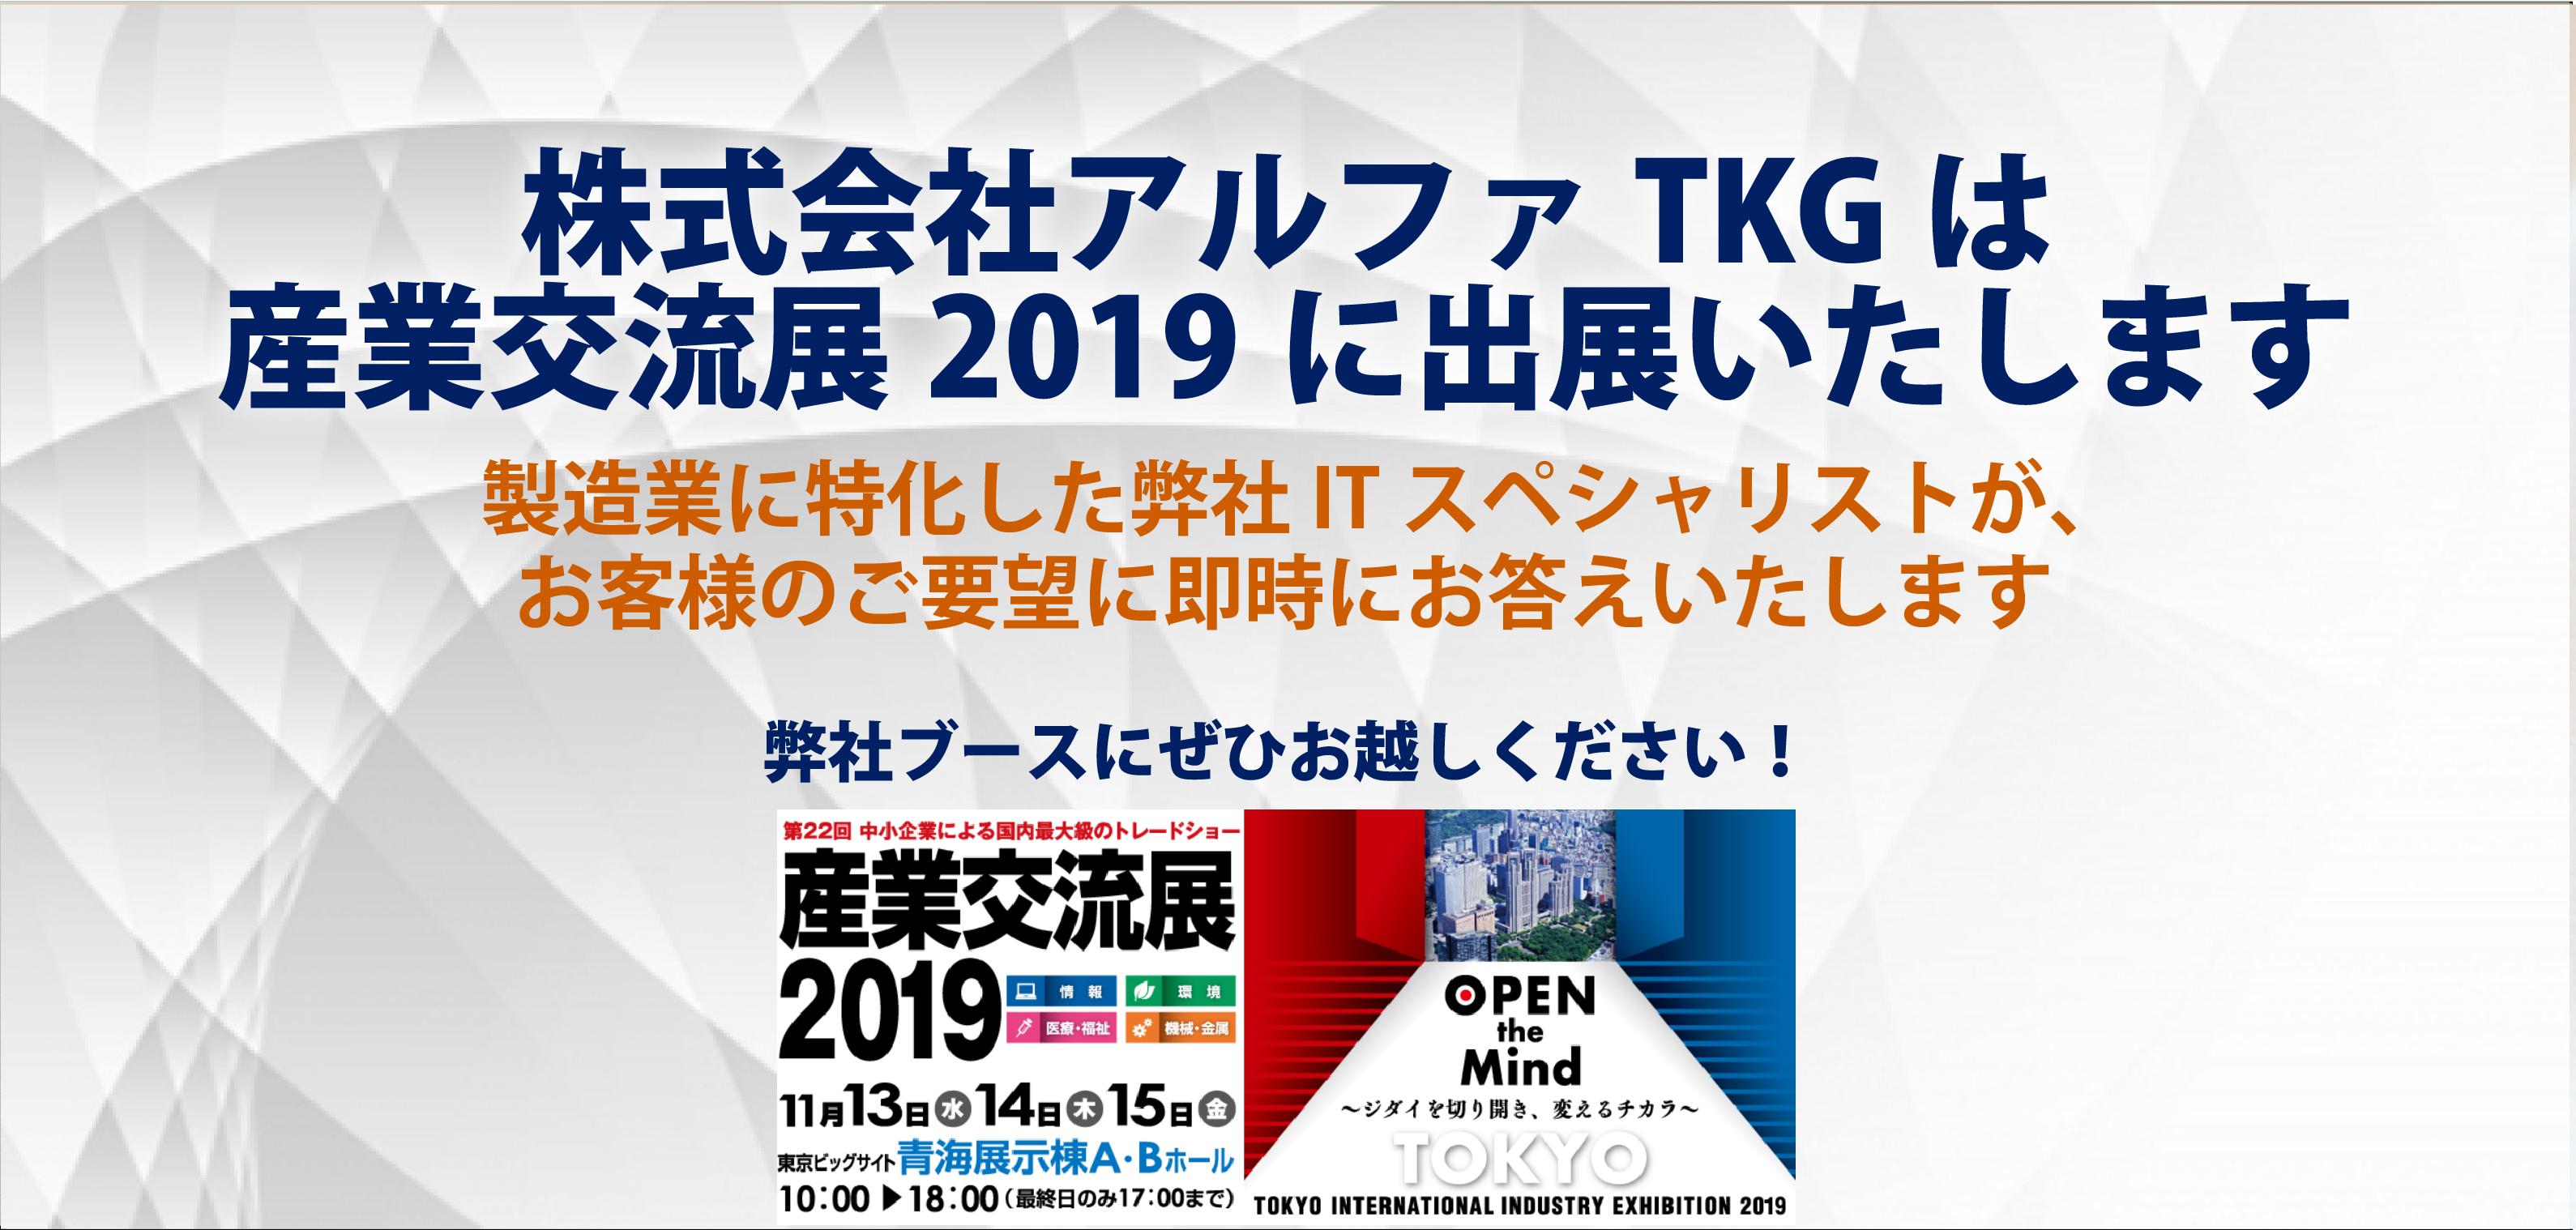 91027_産業交流展2019_D07